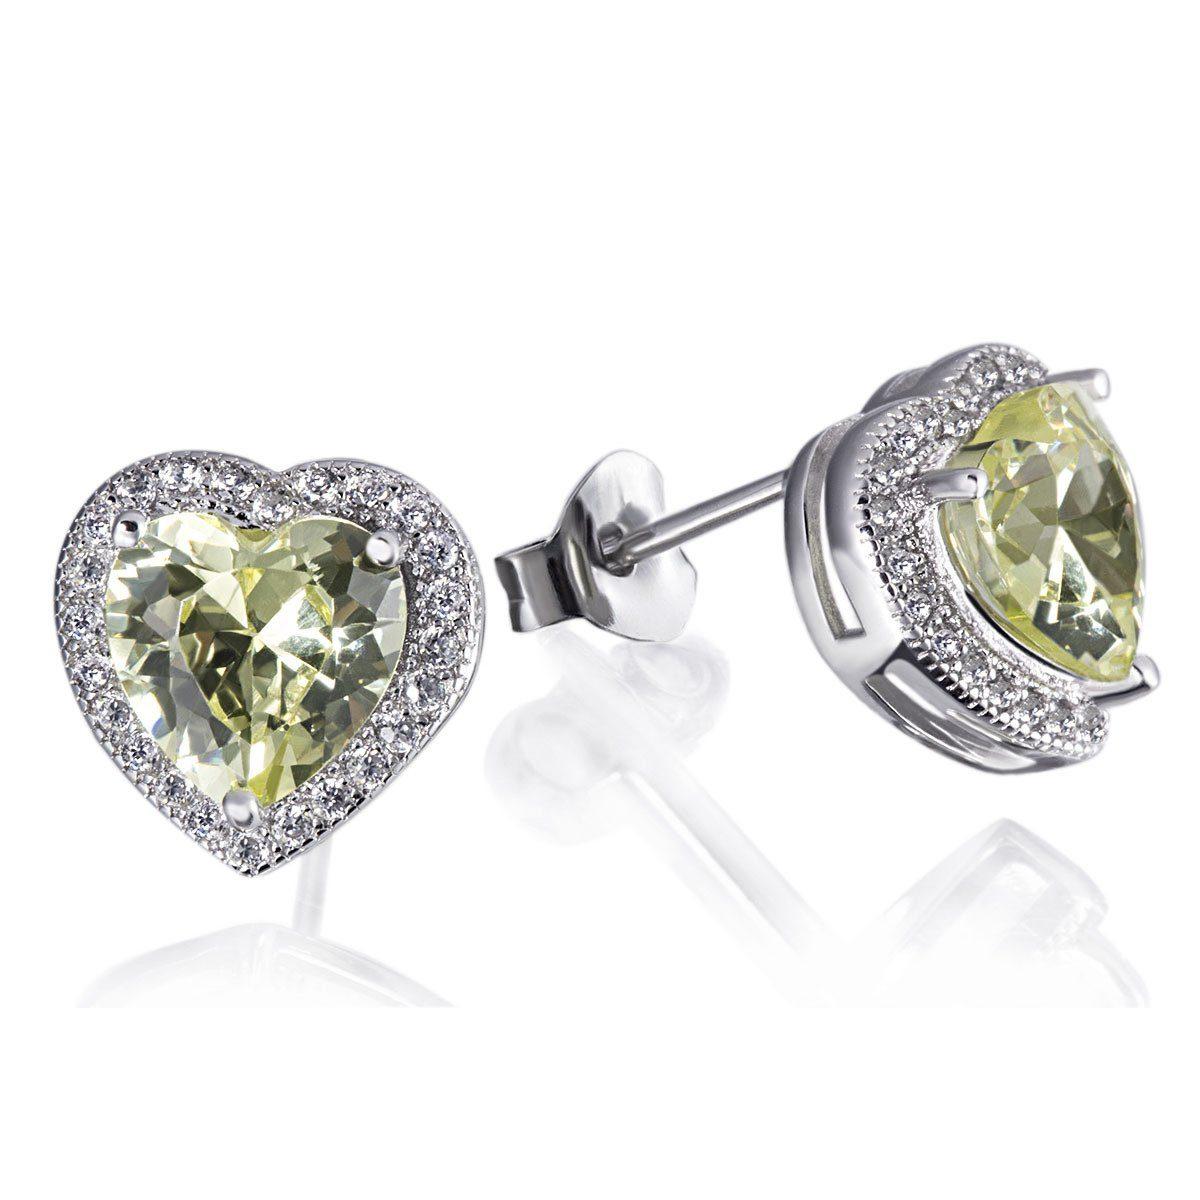 goldmaid Paar Ohrstecker 925/- Silber 2 grüne 40 weiße Zirkonia